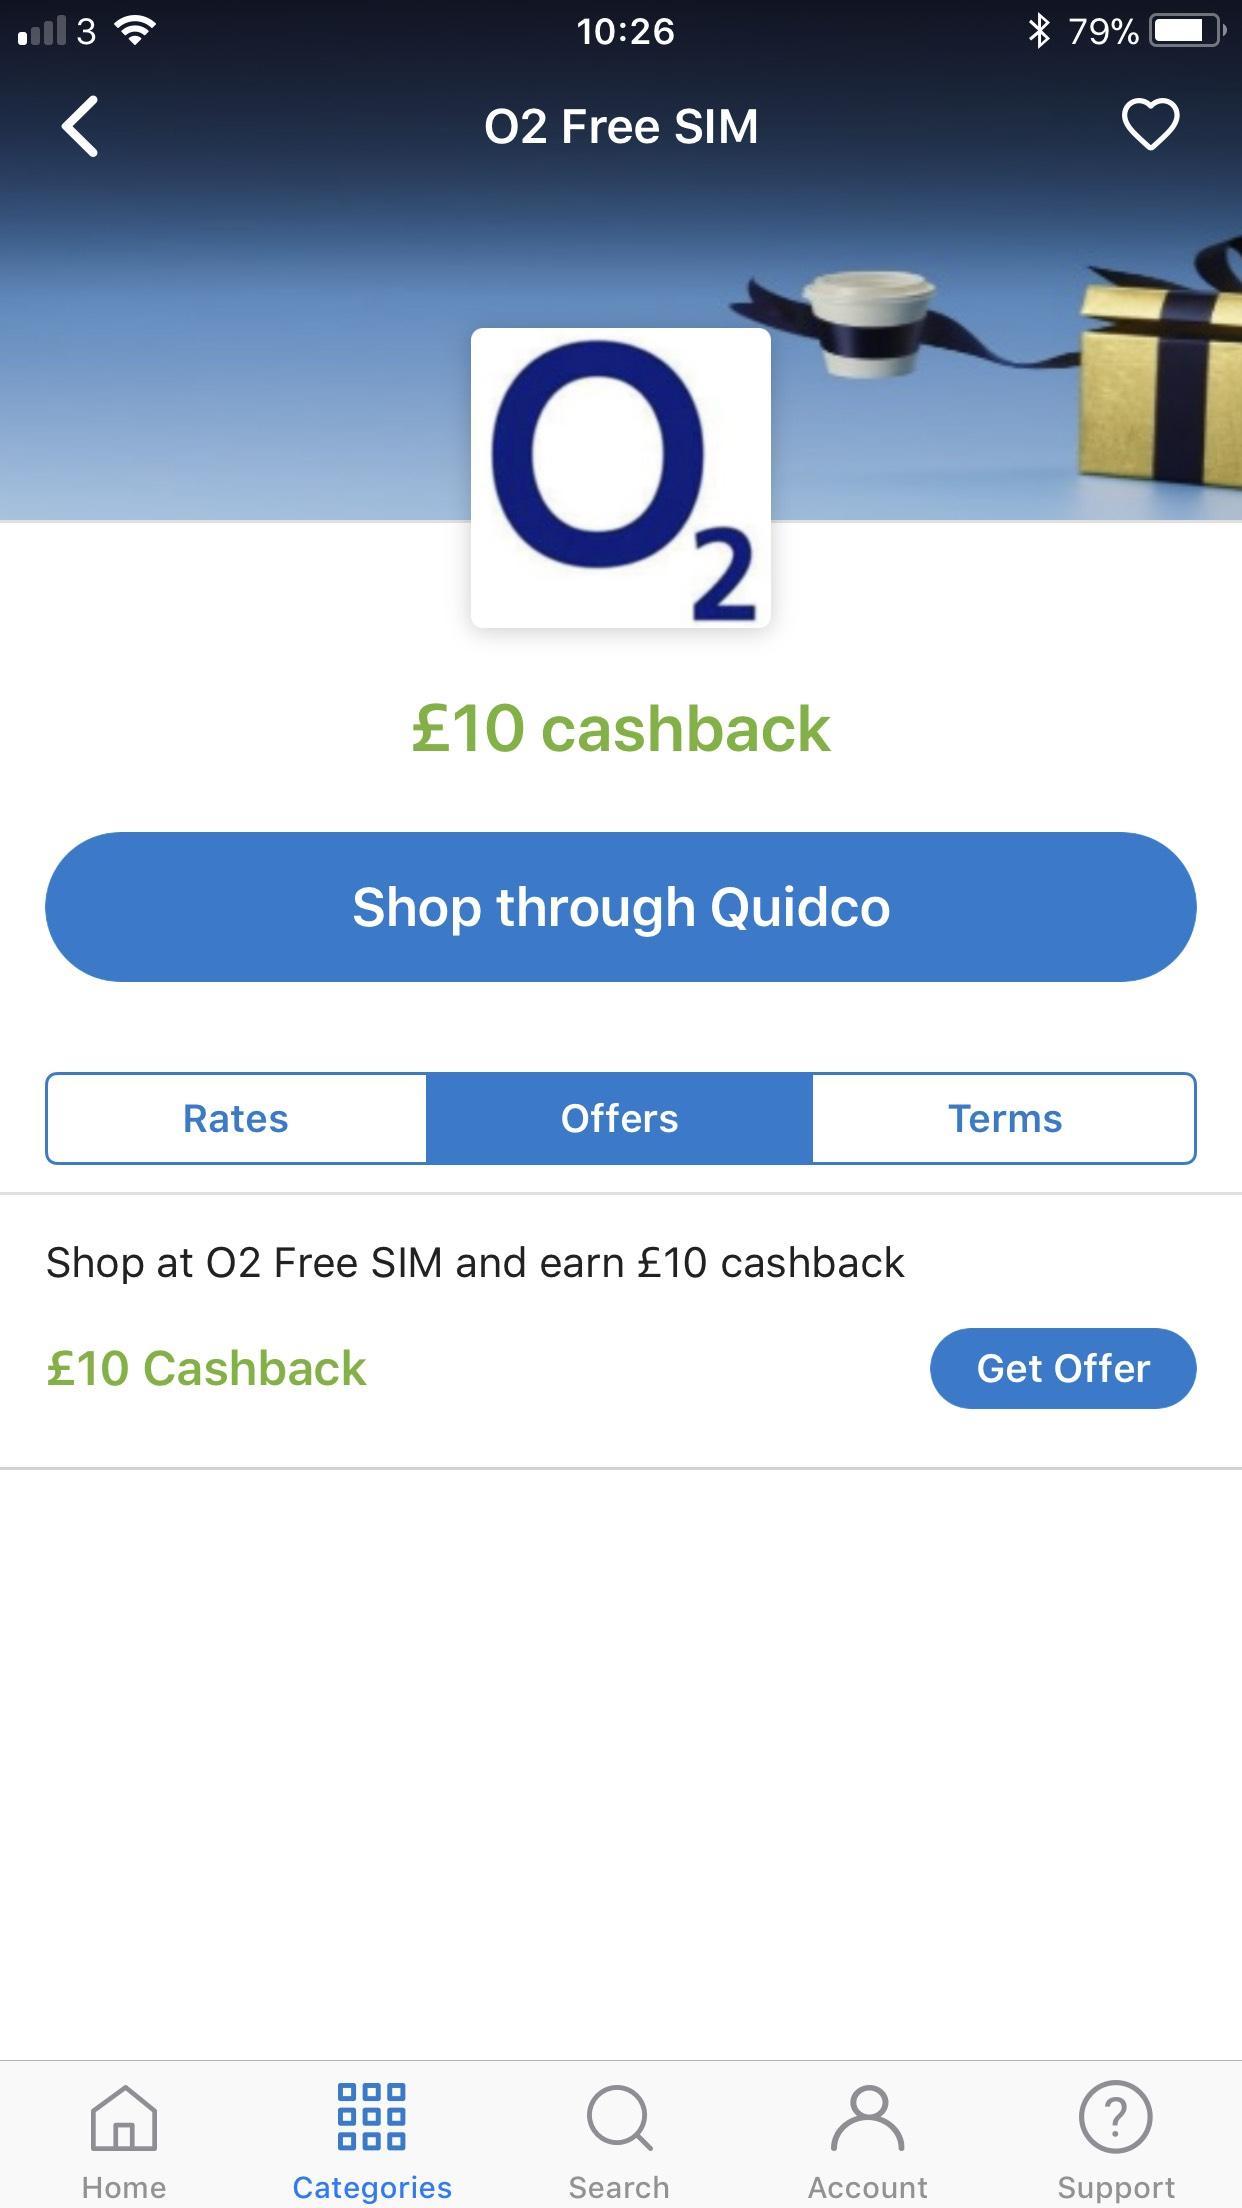 Earn £10 cashback through via Quidco for ordering a free o2 sim